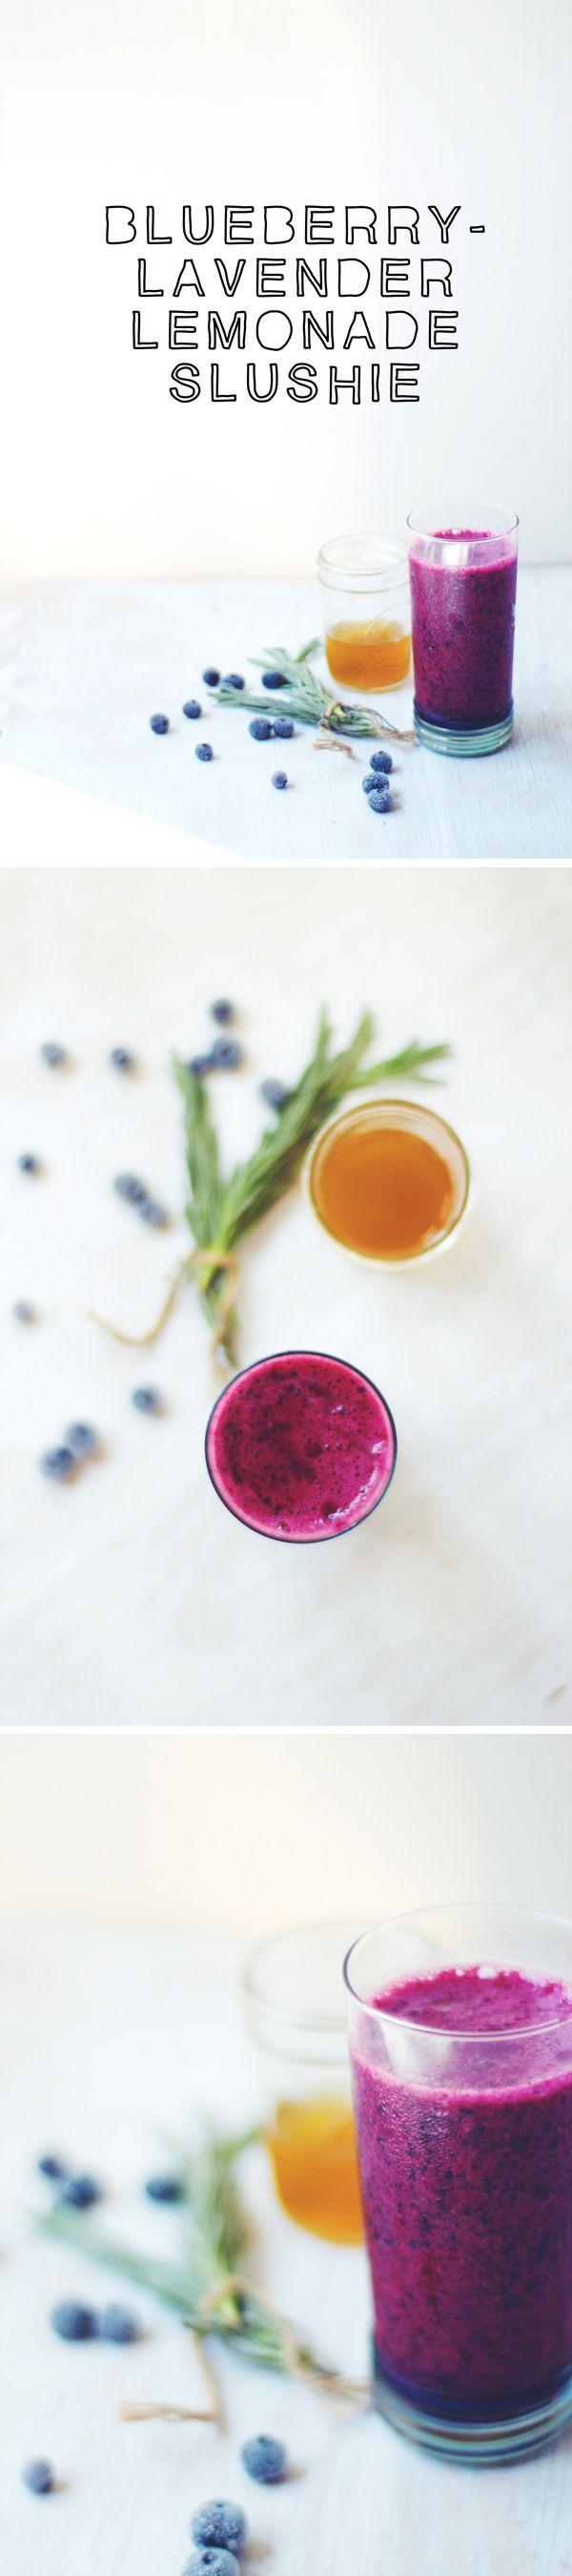 blueberry lavender lemonade slushie | Cheers! I'll Drink To That | Pi ...